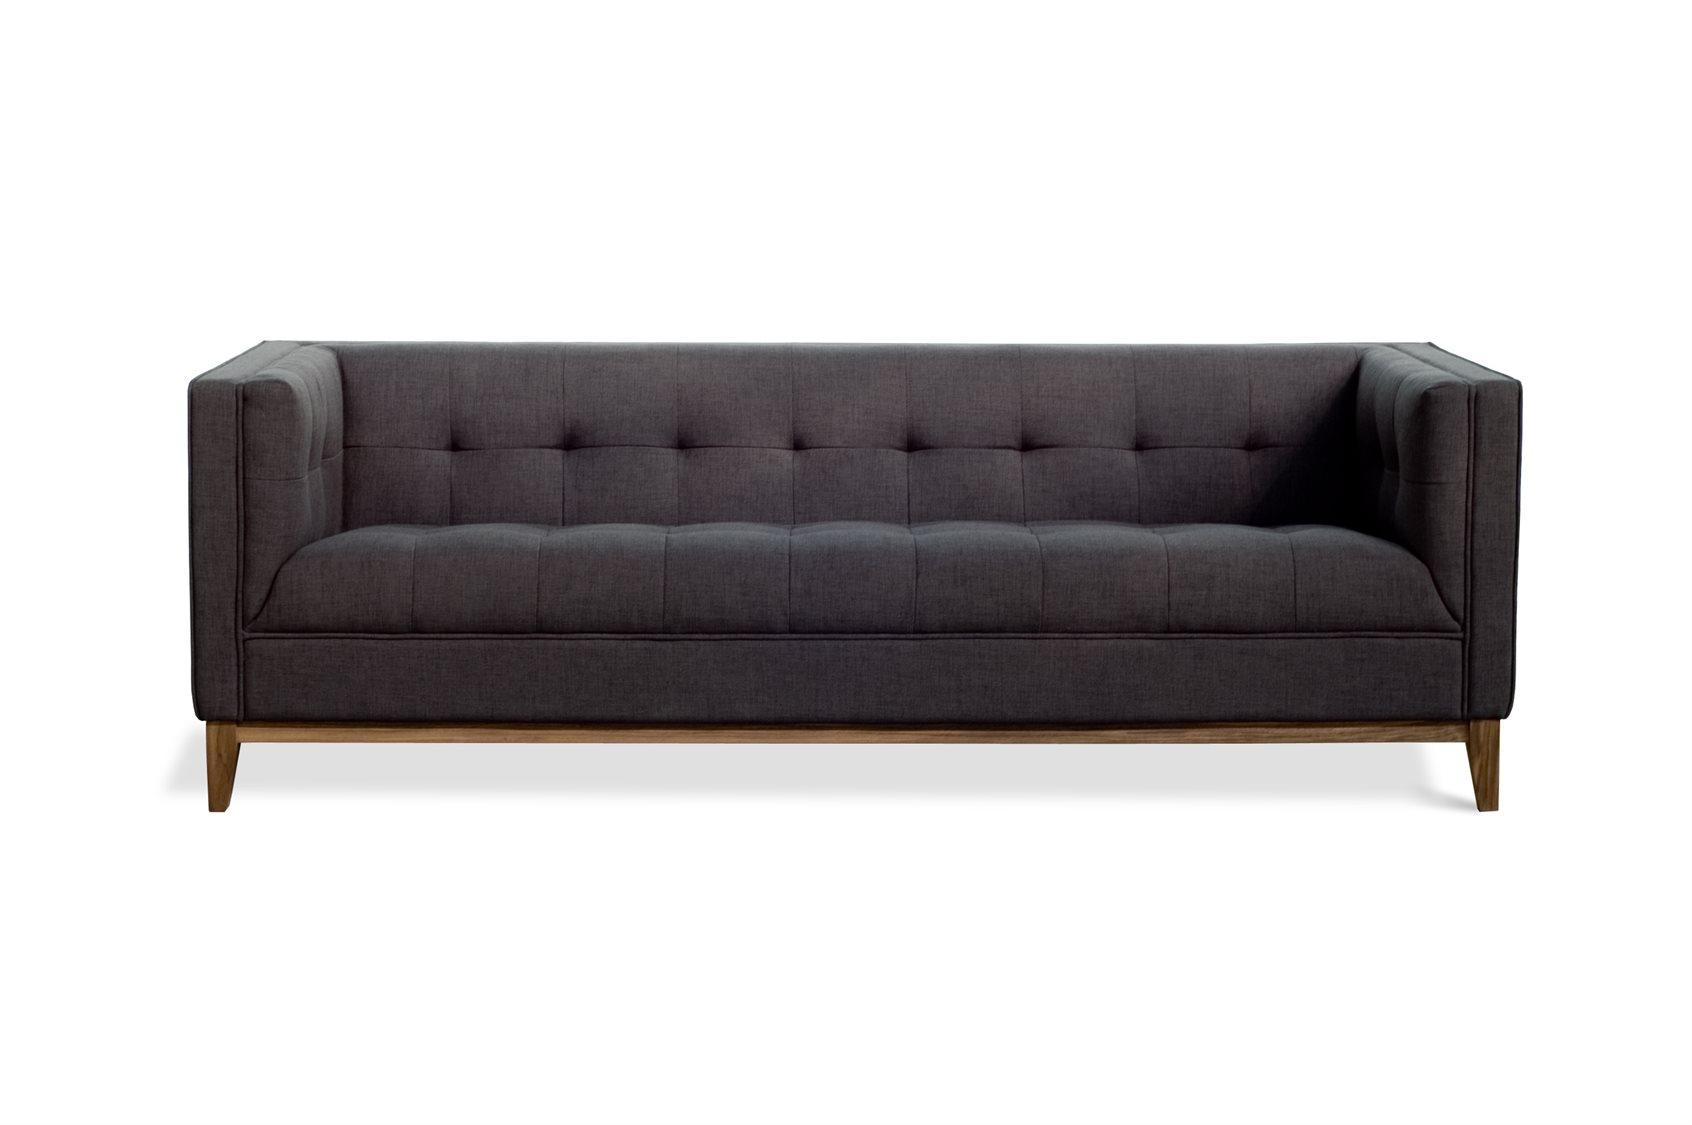 Gus* Modern Atwood Sofa Set